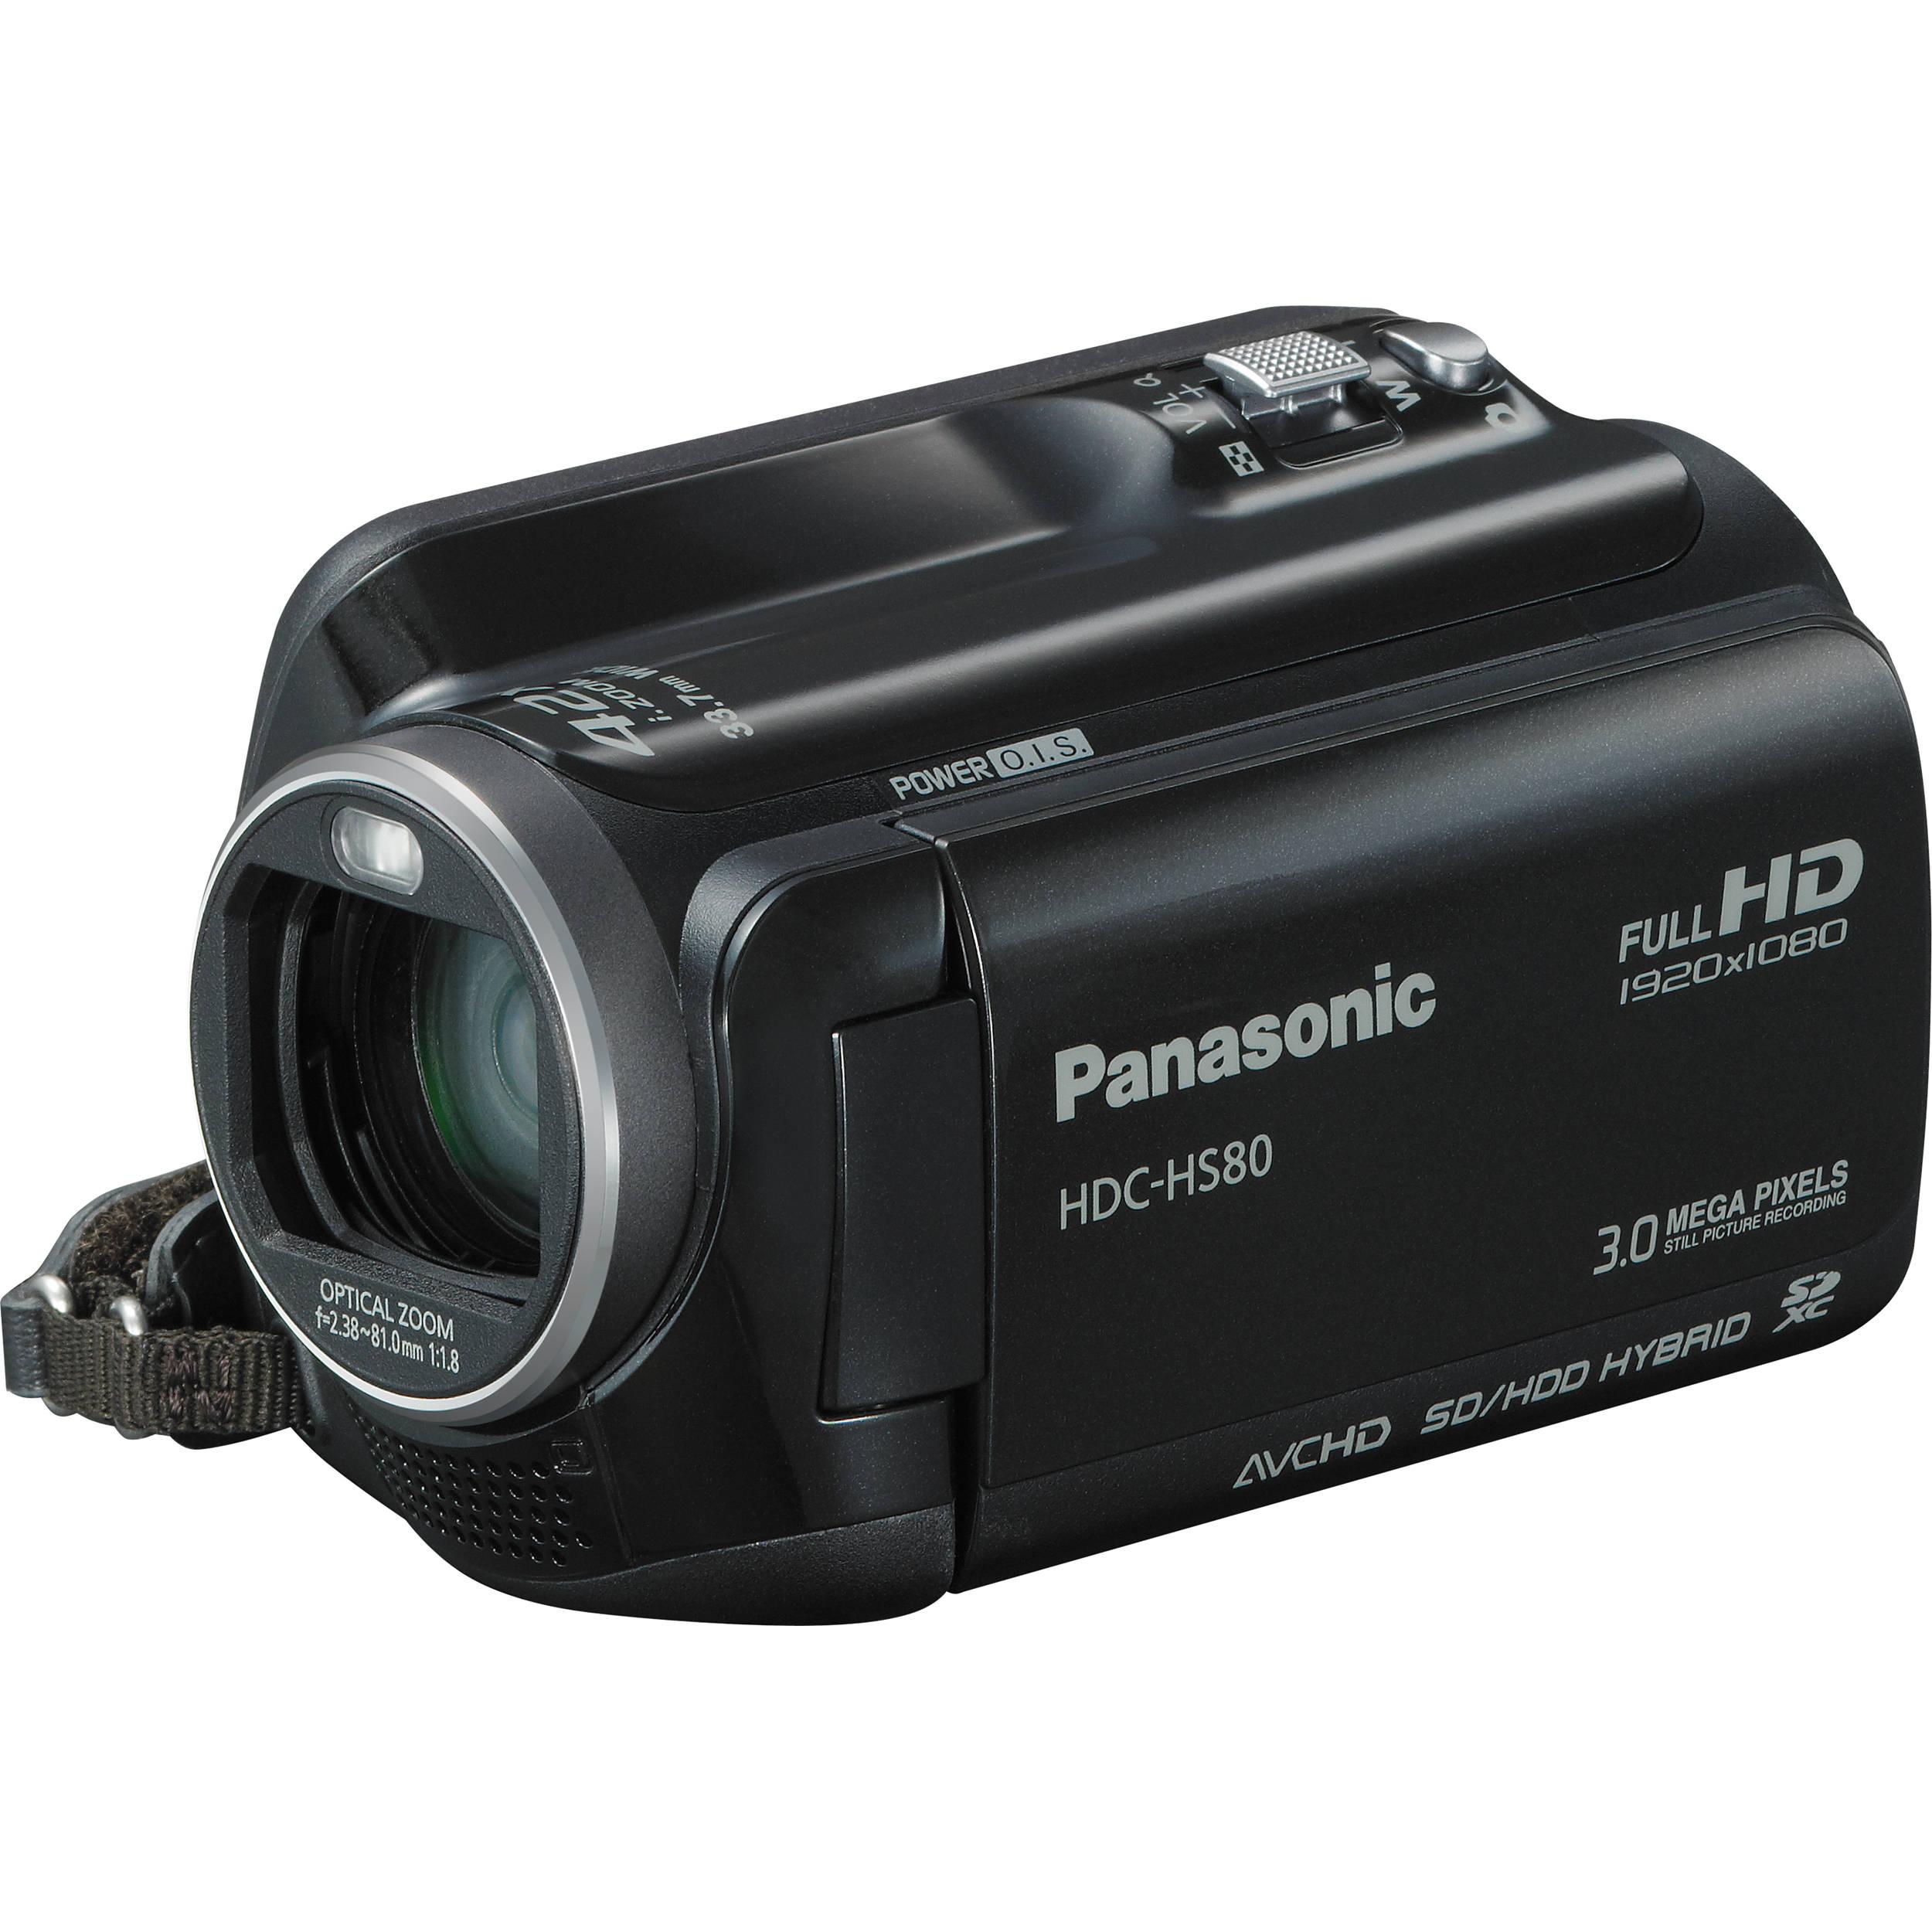 panasonic hdc hs80 camcorder hdc hs80k b h photo video rh bhphotovideo com Panasonic.comsupportbycncompass Panasonic Owner's Manual